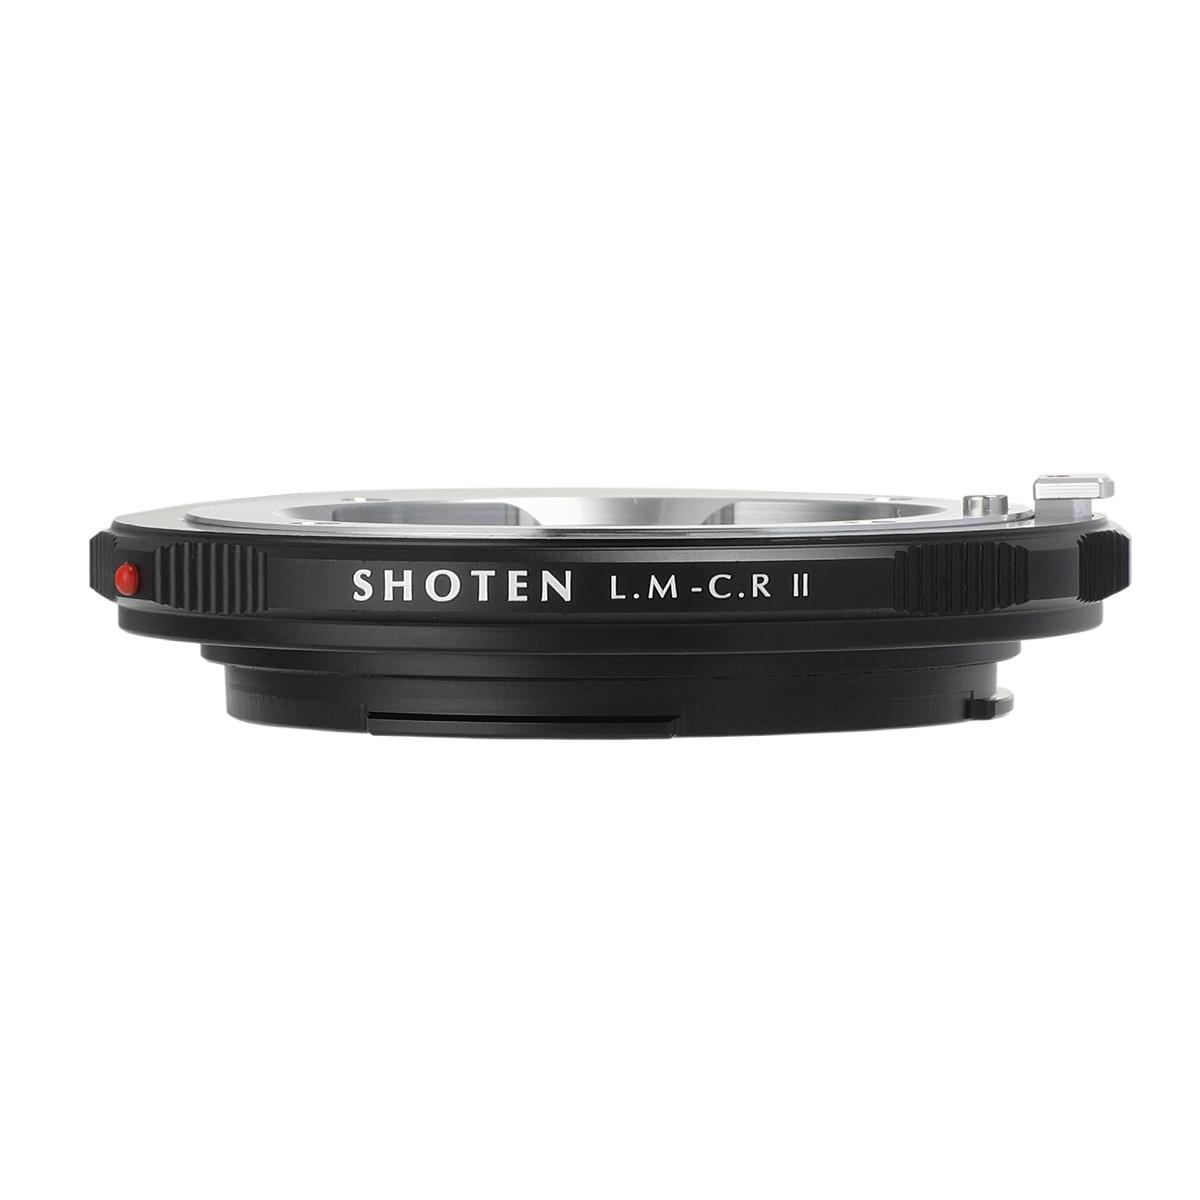 SHOTEN LM-CR II(ライカMマウントレンズ → キヤノンRFマウント変換)マウントアダプター